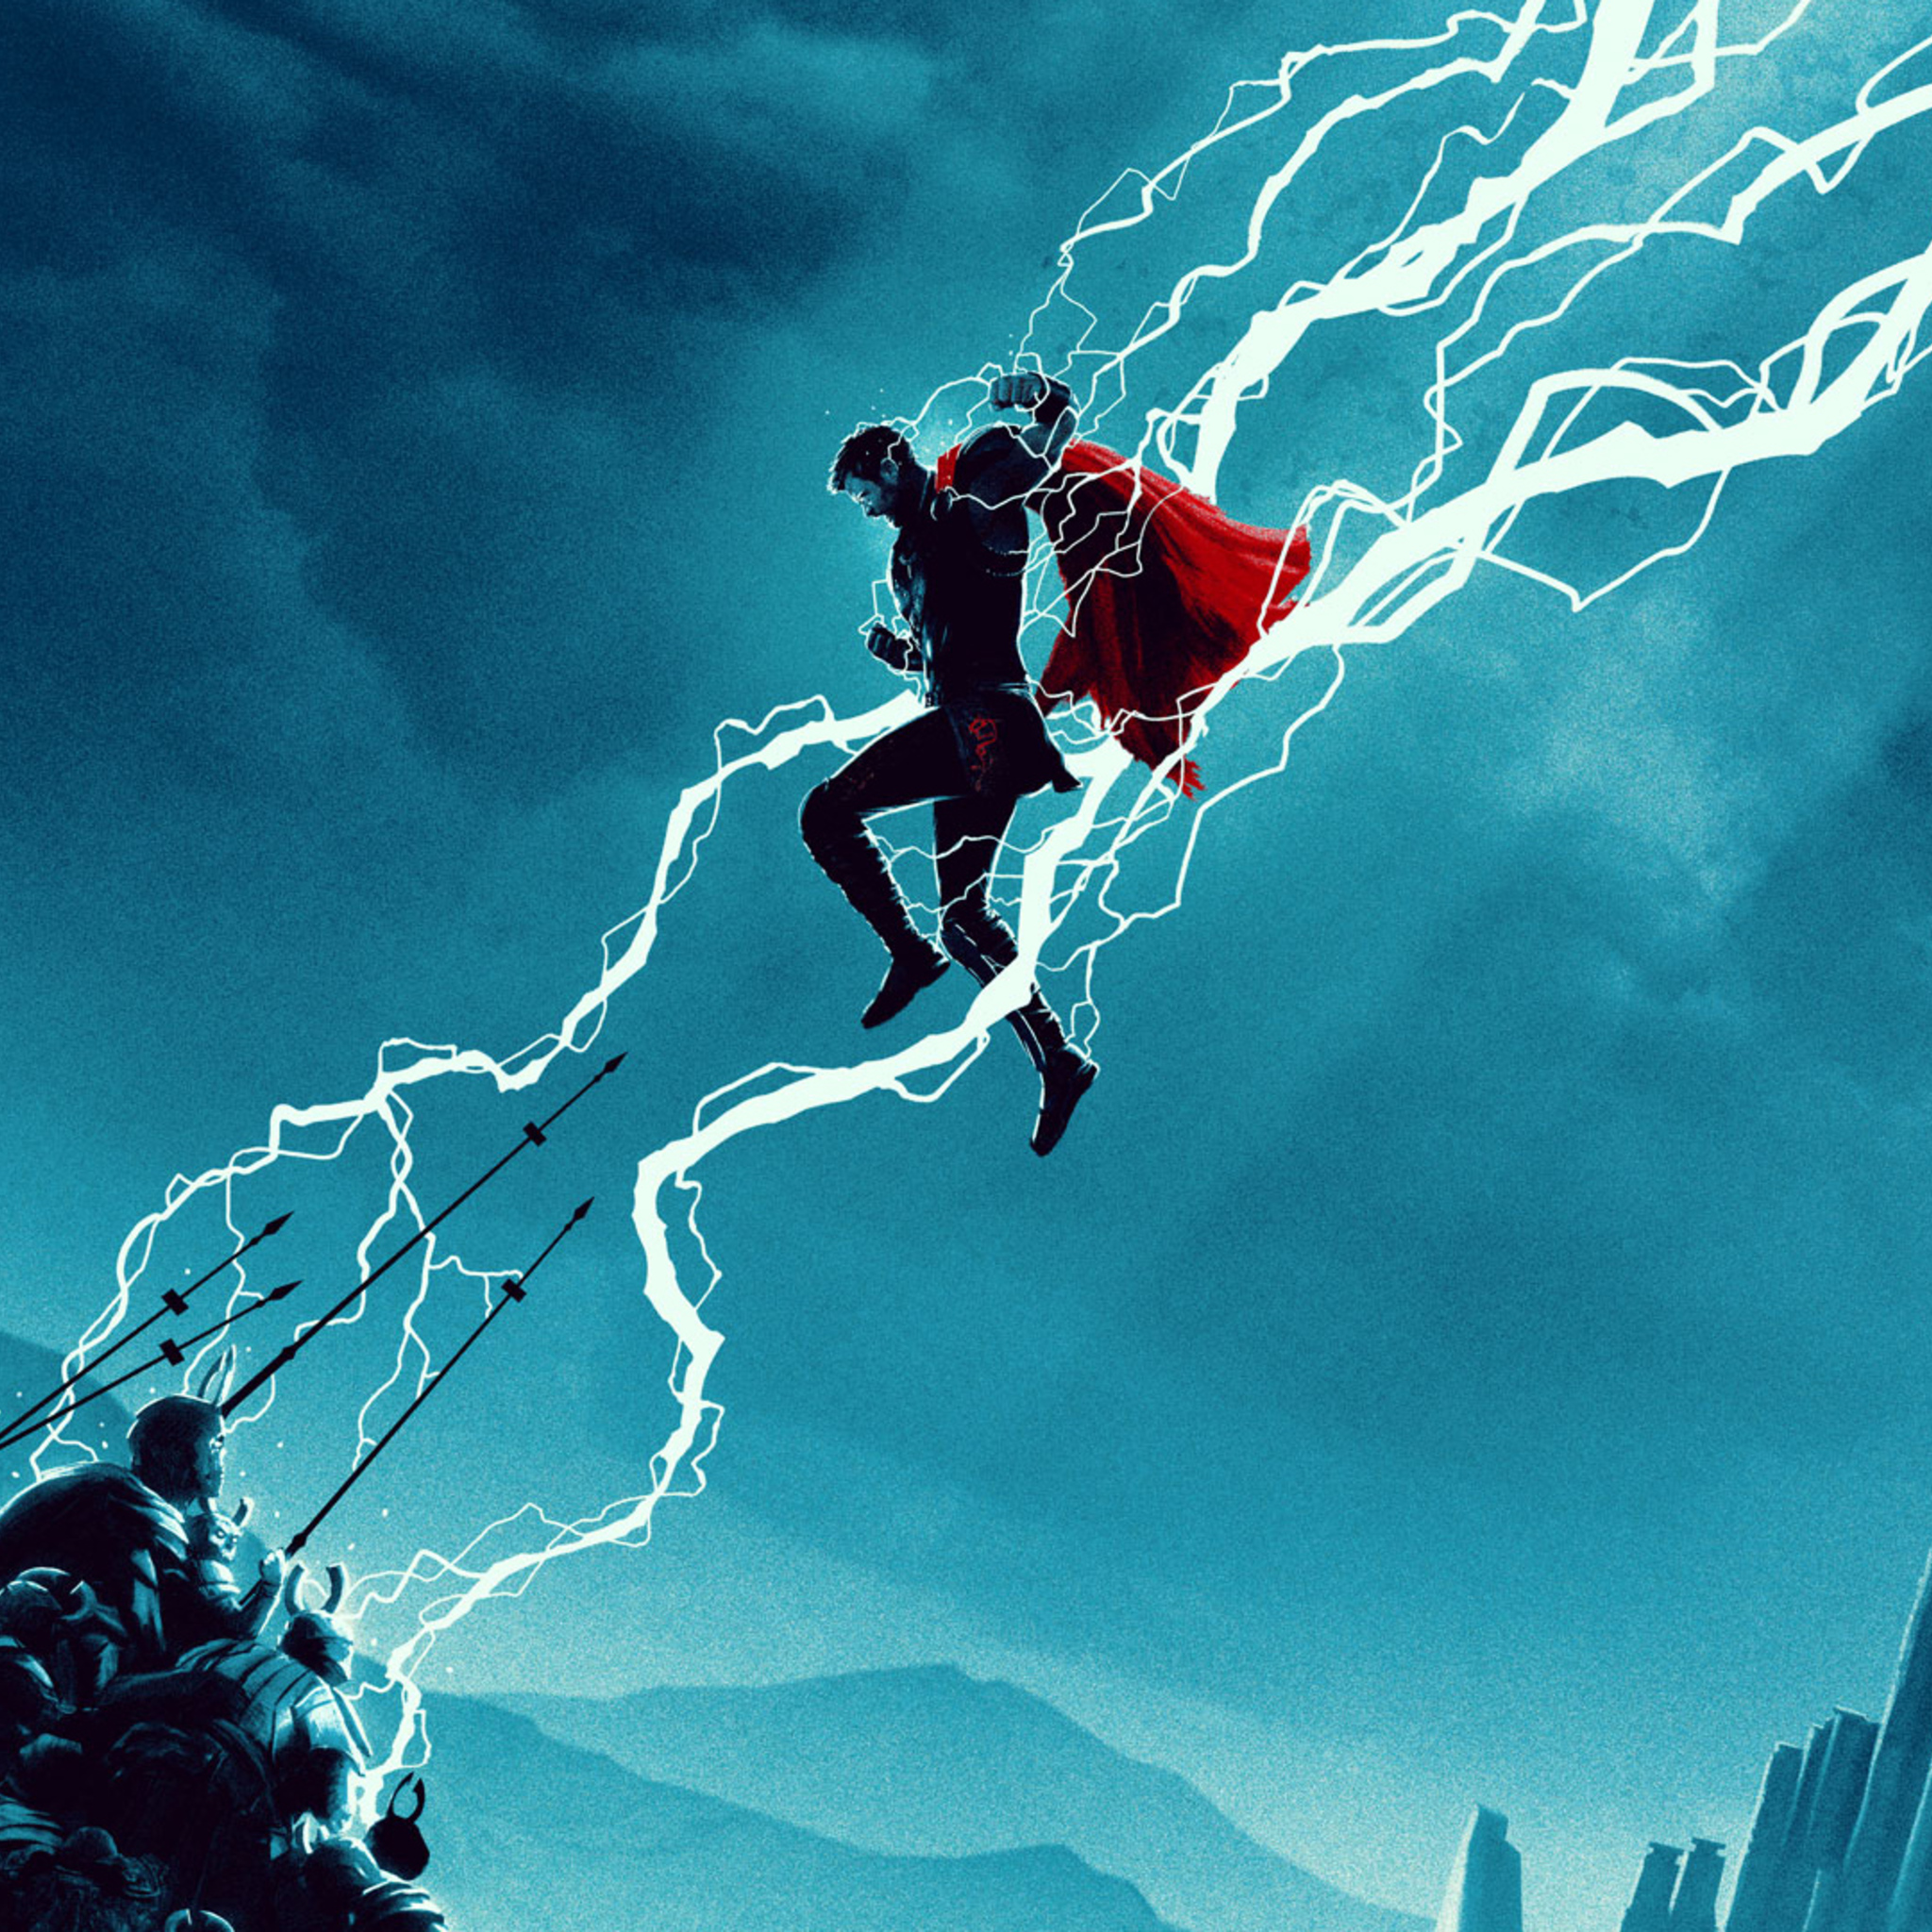 2048x2048 Thor Ragnarok Movie Artwork 2018 Ipad Air HD 4k ...